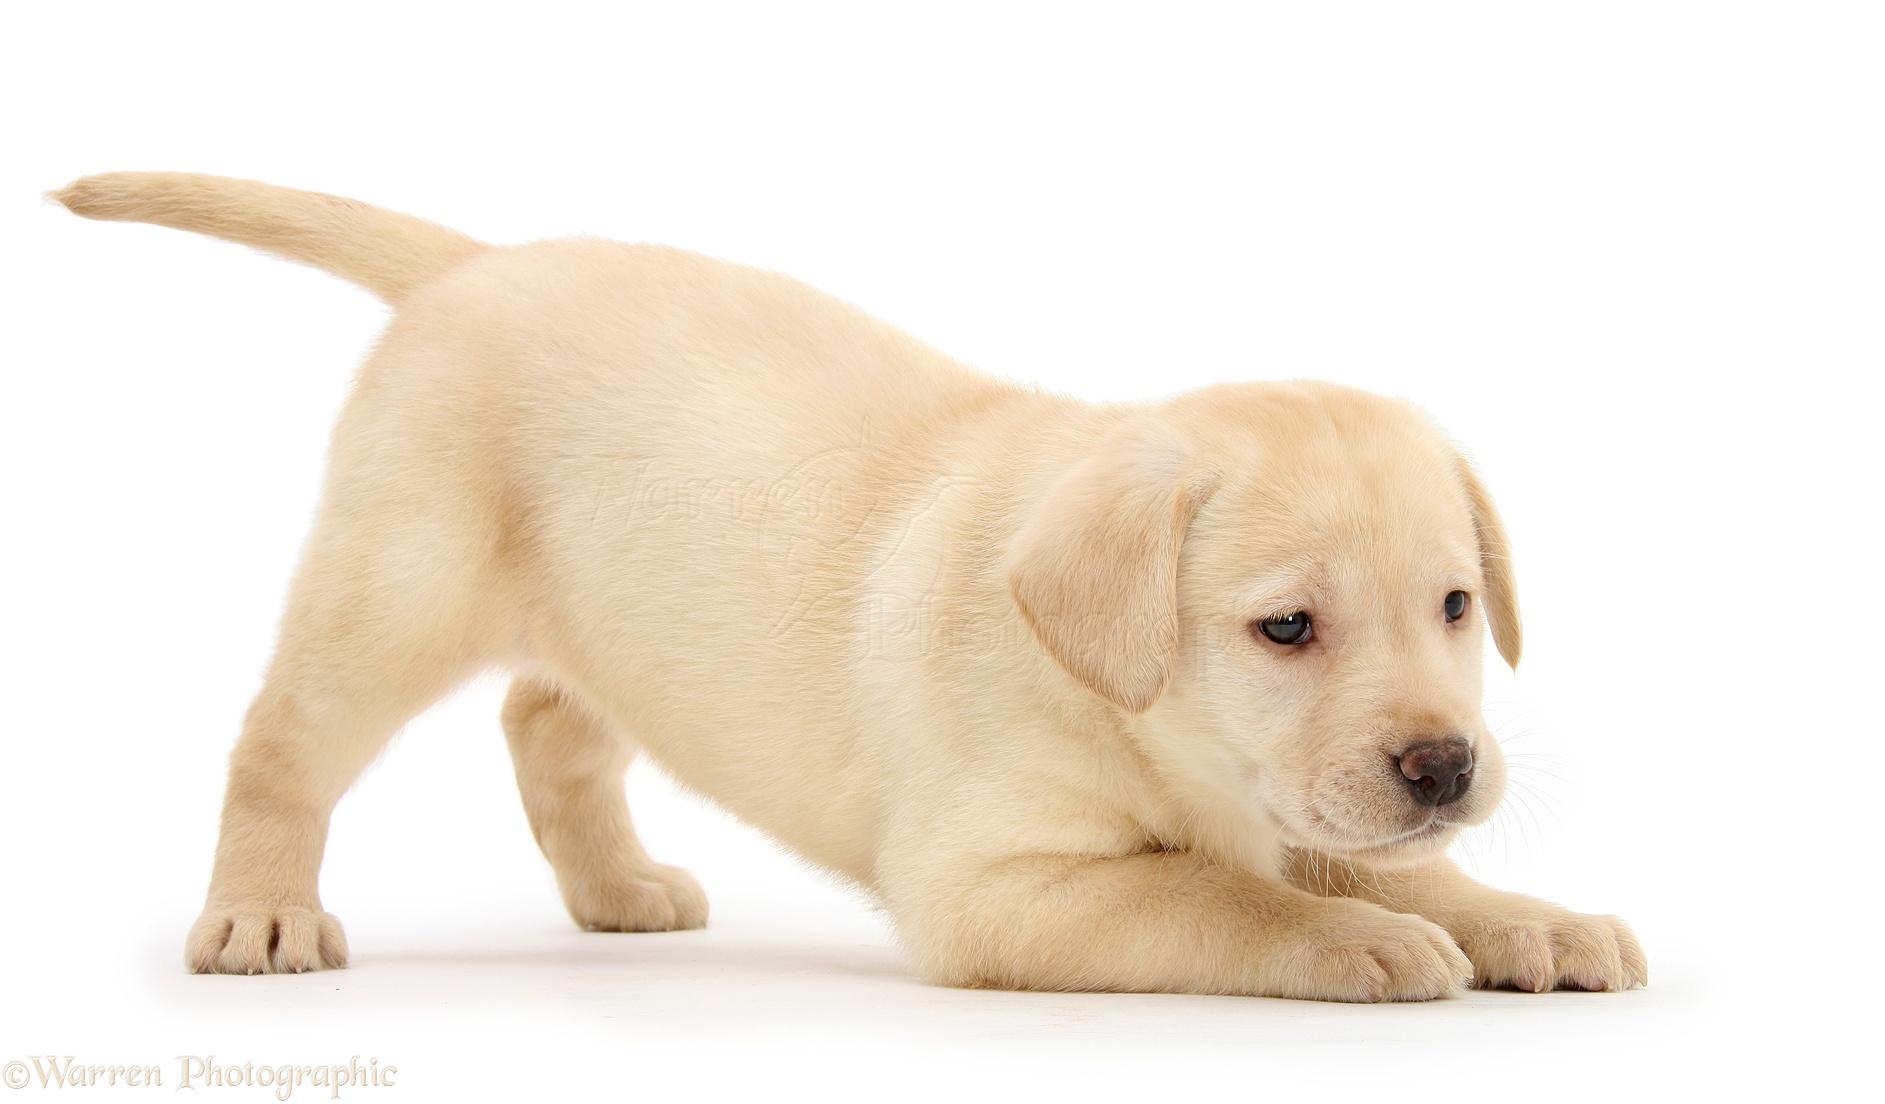 Dog: Yellow Labrador Retriever puppy, in play-bow photo WP23223